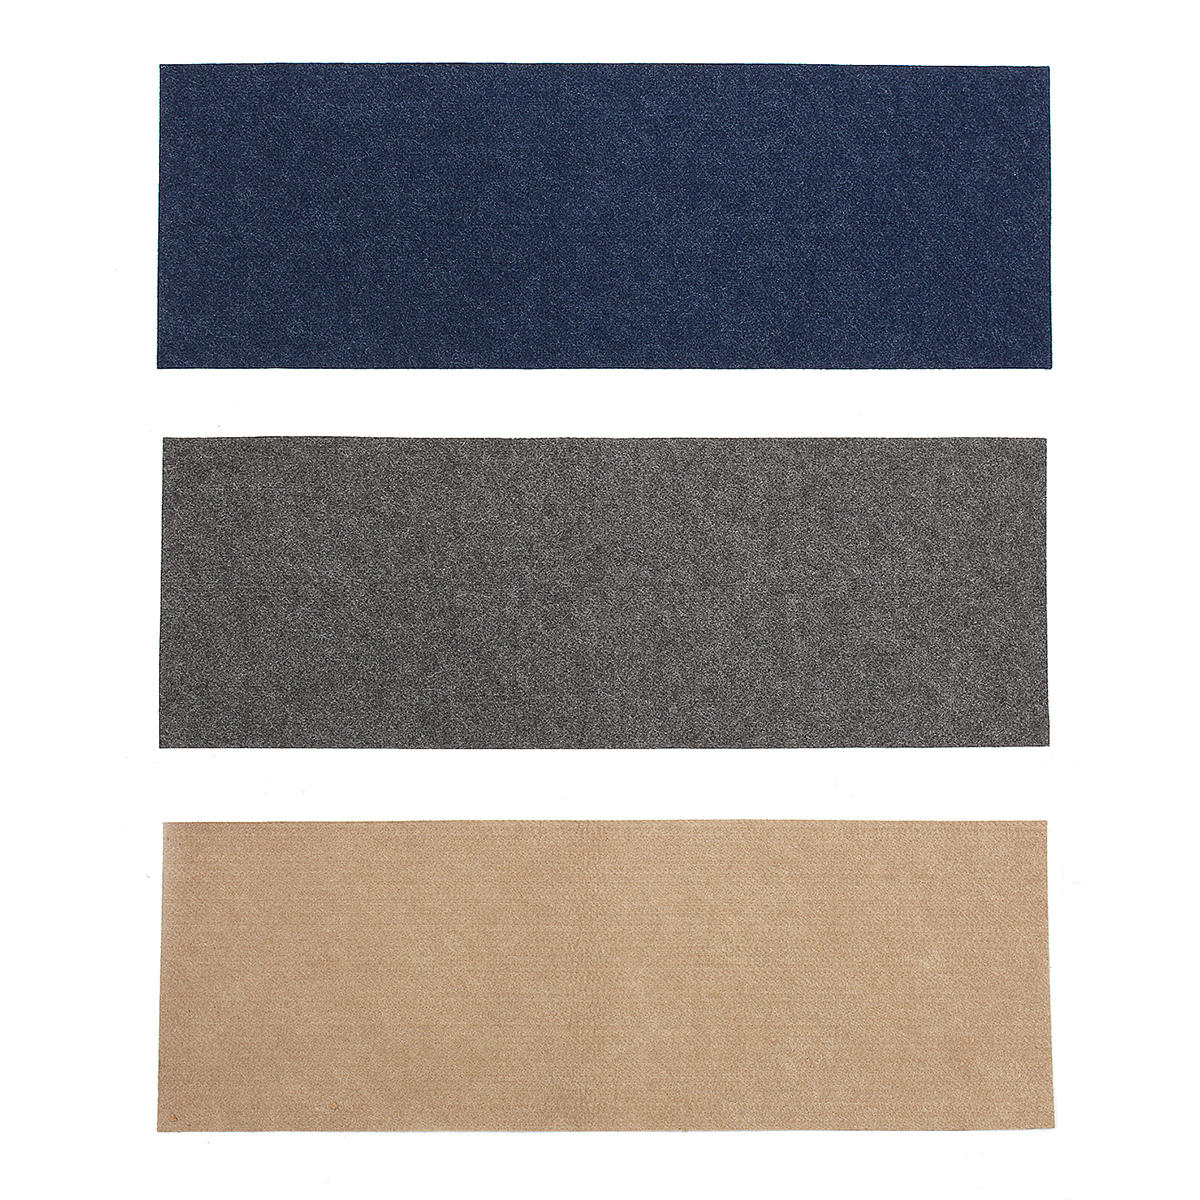 5pcs Self Adhesive Non Slip Stair Carpet Mat Reusable Washable Diy Floor Mat For Kitchen Living Room Stairway Pads Rug Soft Doormat Sale Banggood Com